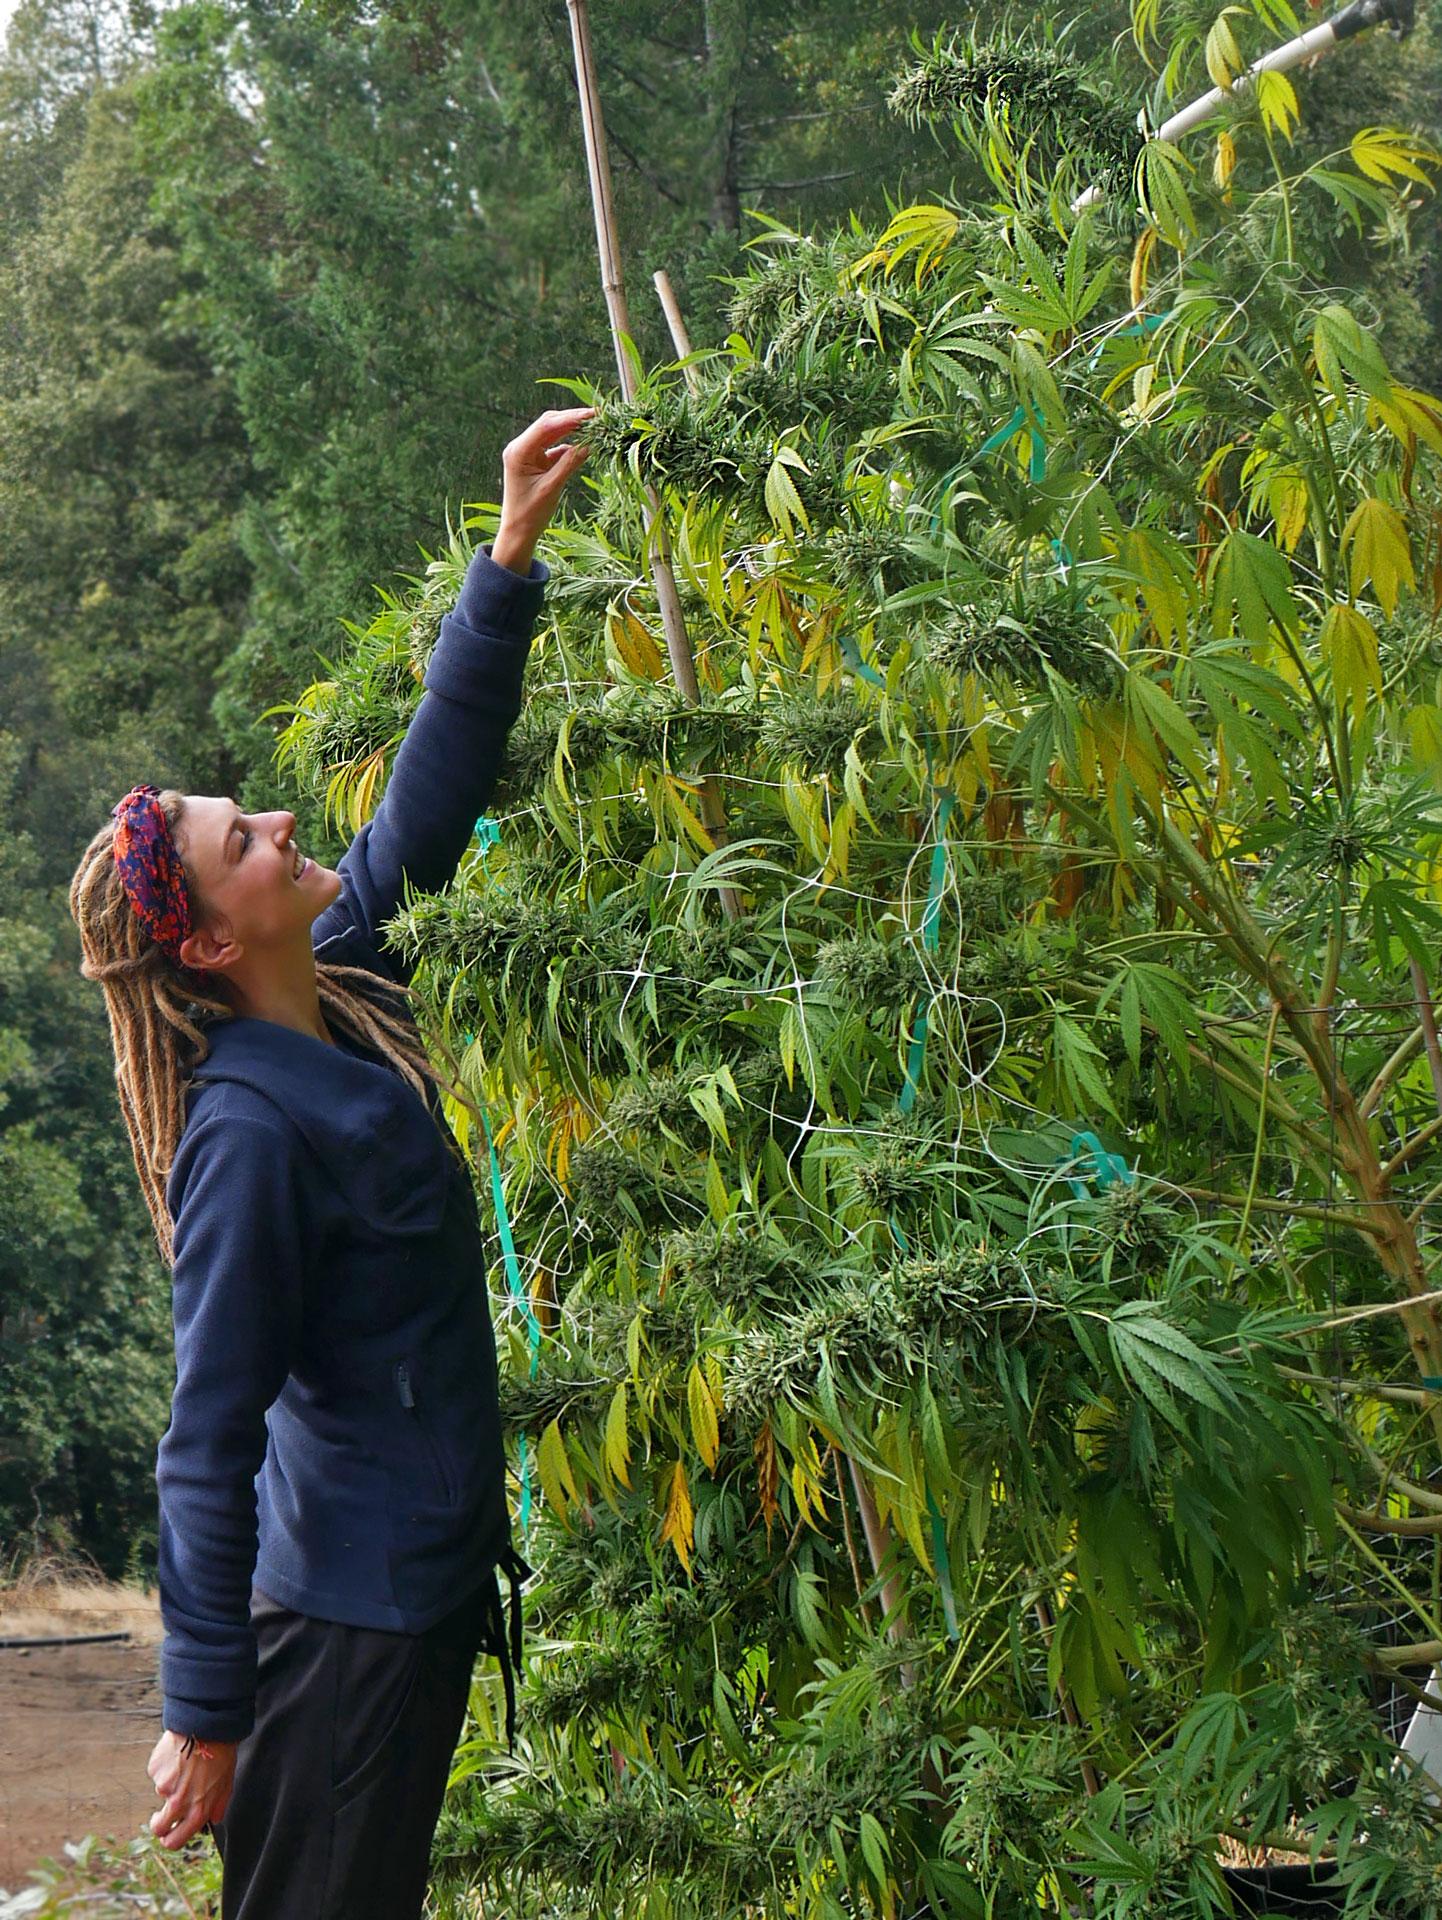 Rasta girl next to tall cannabis plant in Northern California